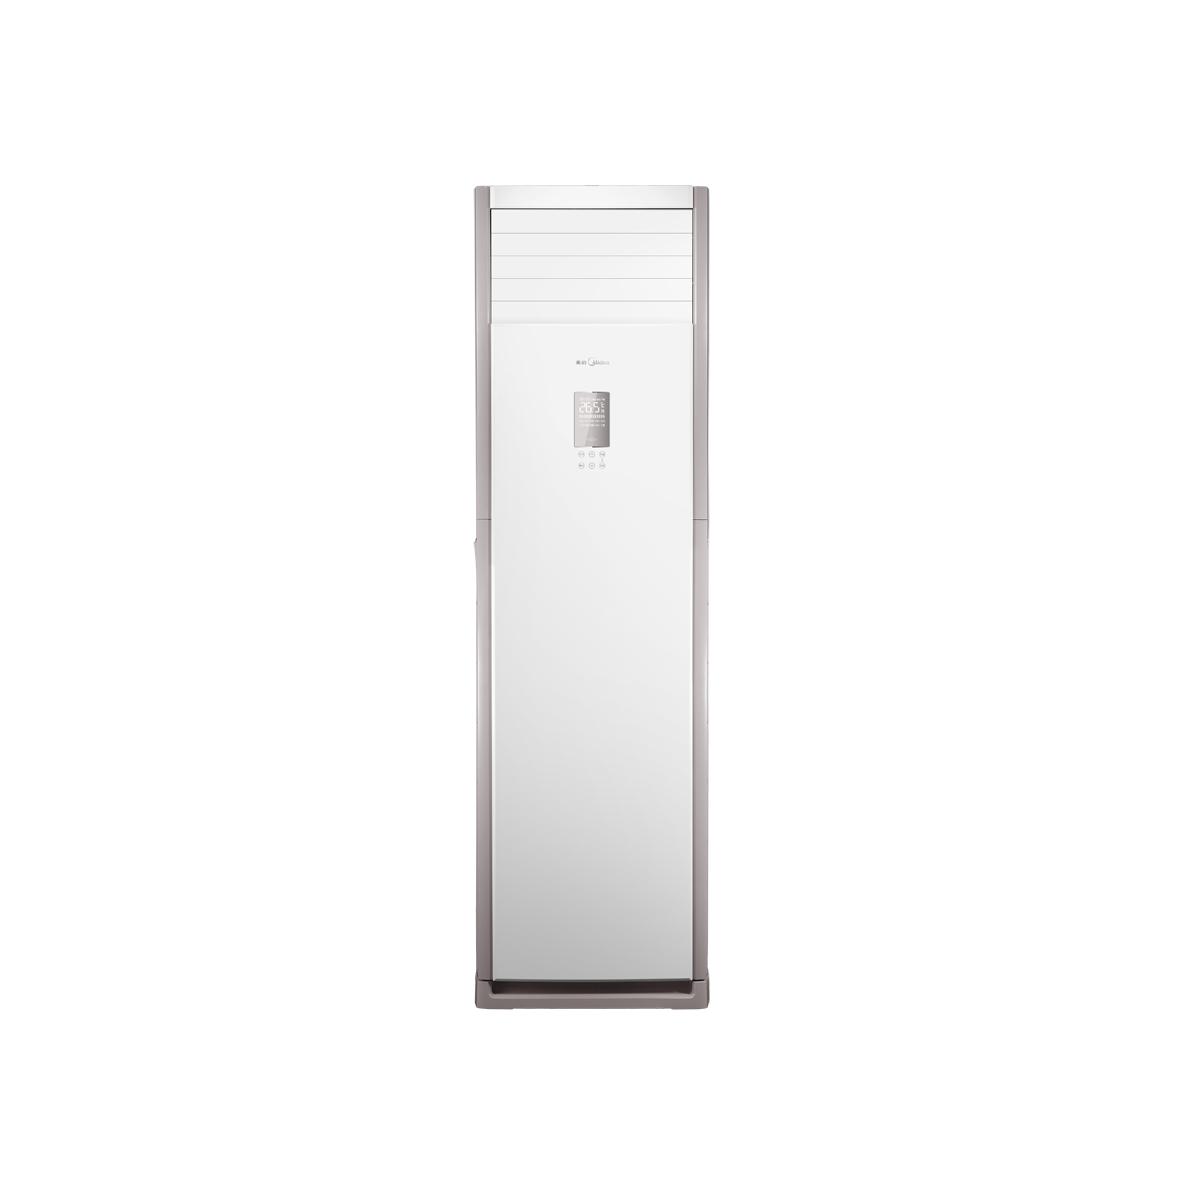 Midea/美的 KFR-73LW/DN8Y-PA400(D2)家用空调套机 说明书.pdf